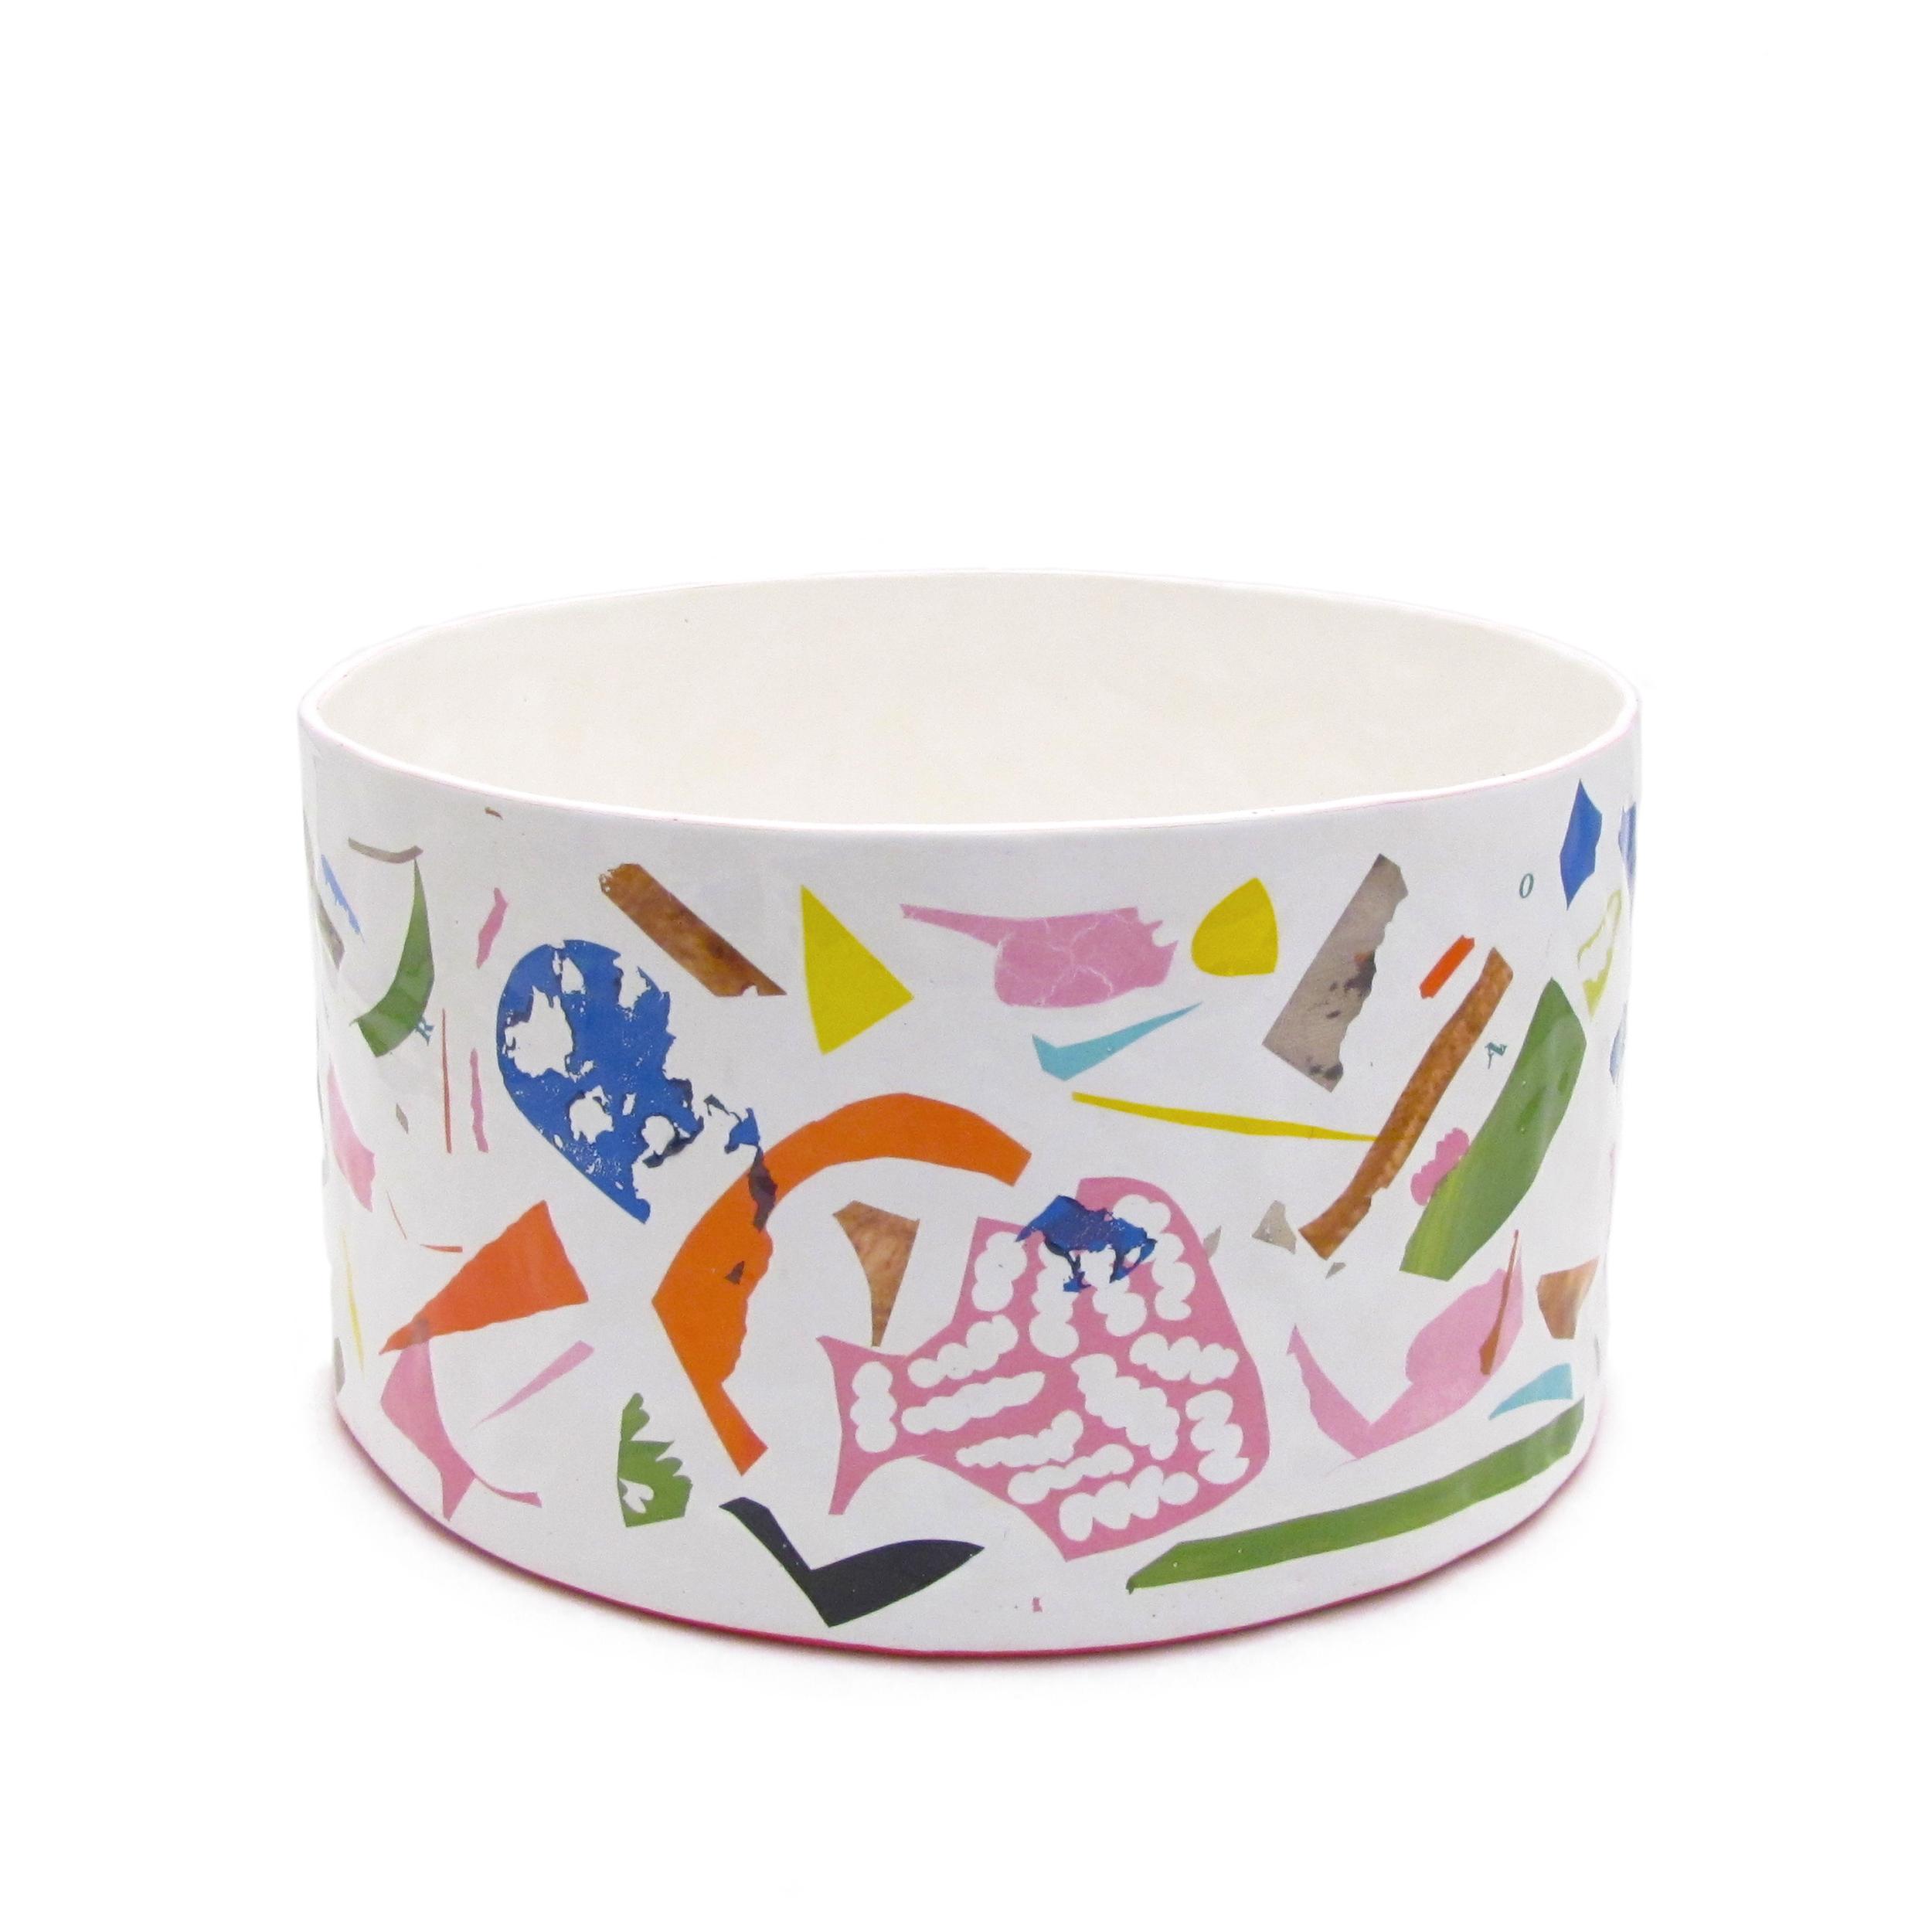 Short Scrap Vase   White earthenware, glaze, decals